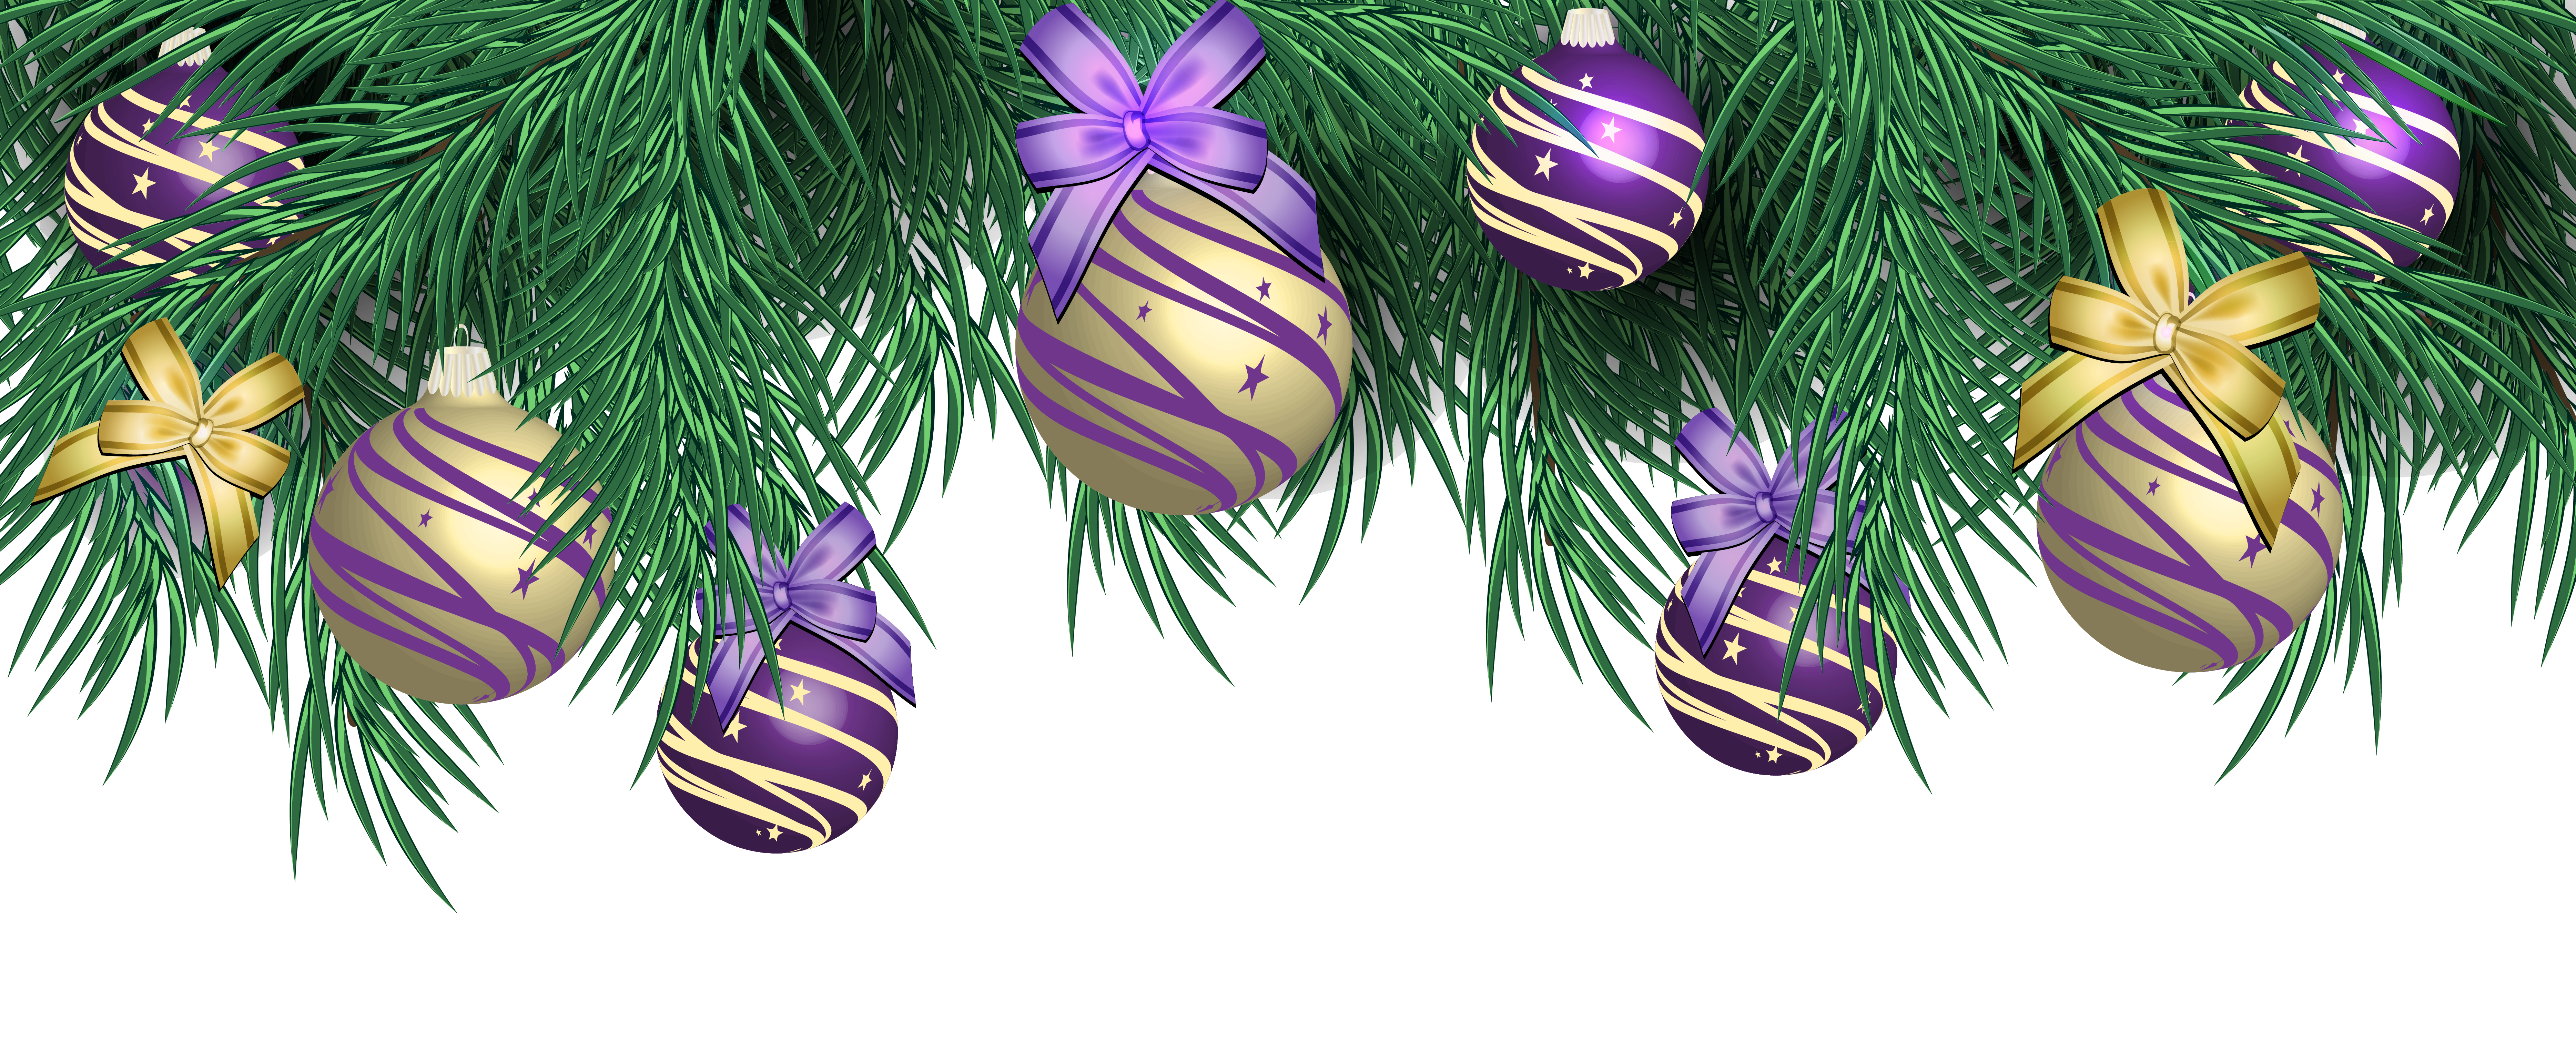 Clipart christmas purple. Transparent pine decor with